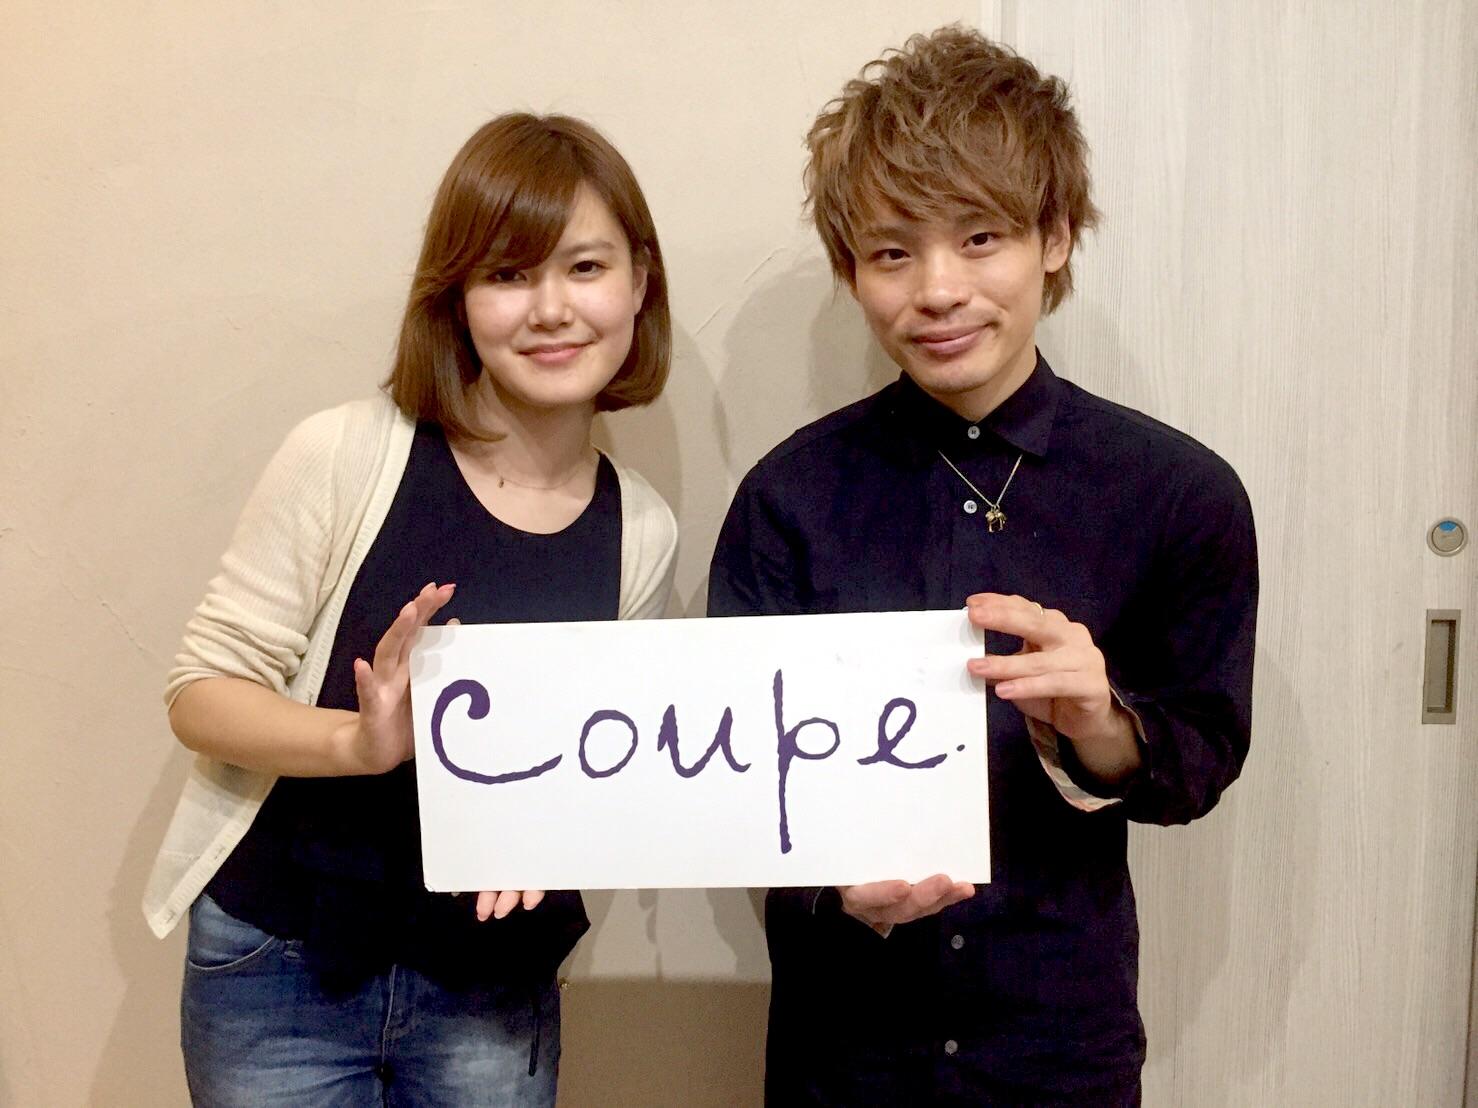 coupeの竹村恵美さんとお会いした話。